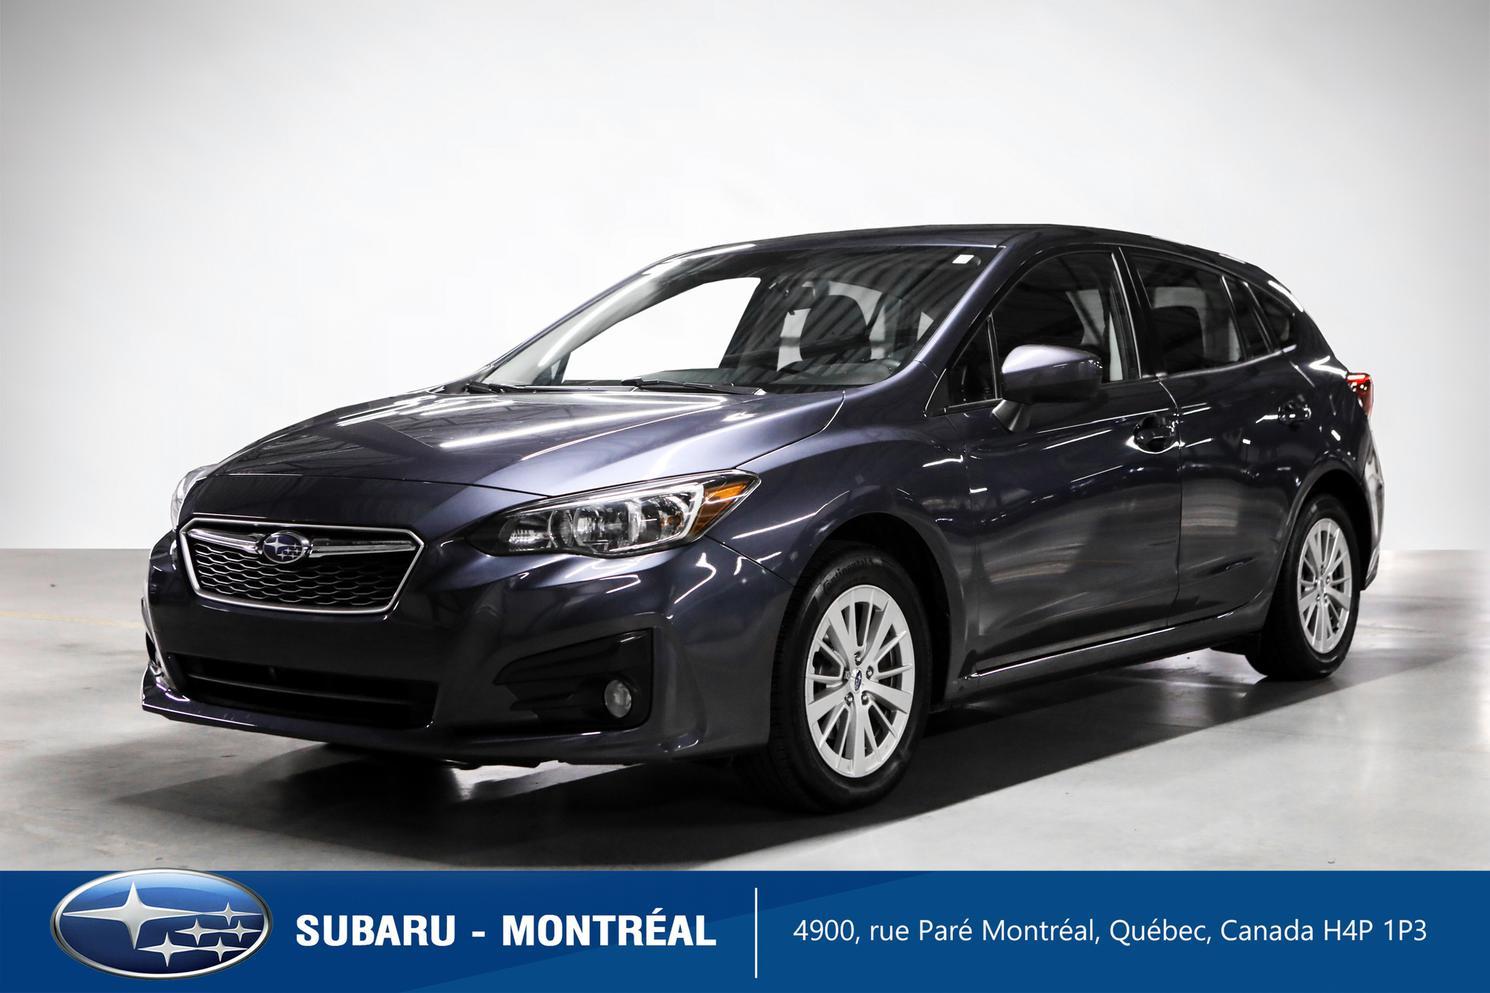 2017 Subaru Impreza Touring Hatchback